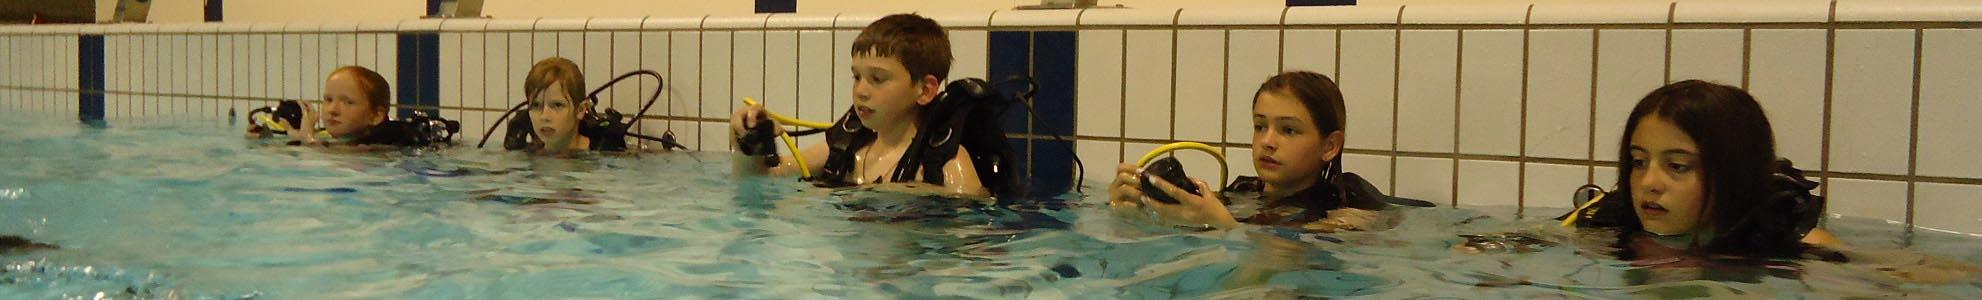 Verslag zwembaduitje 8 oktober